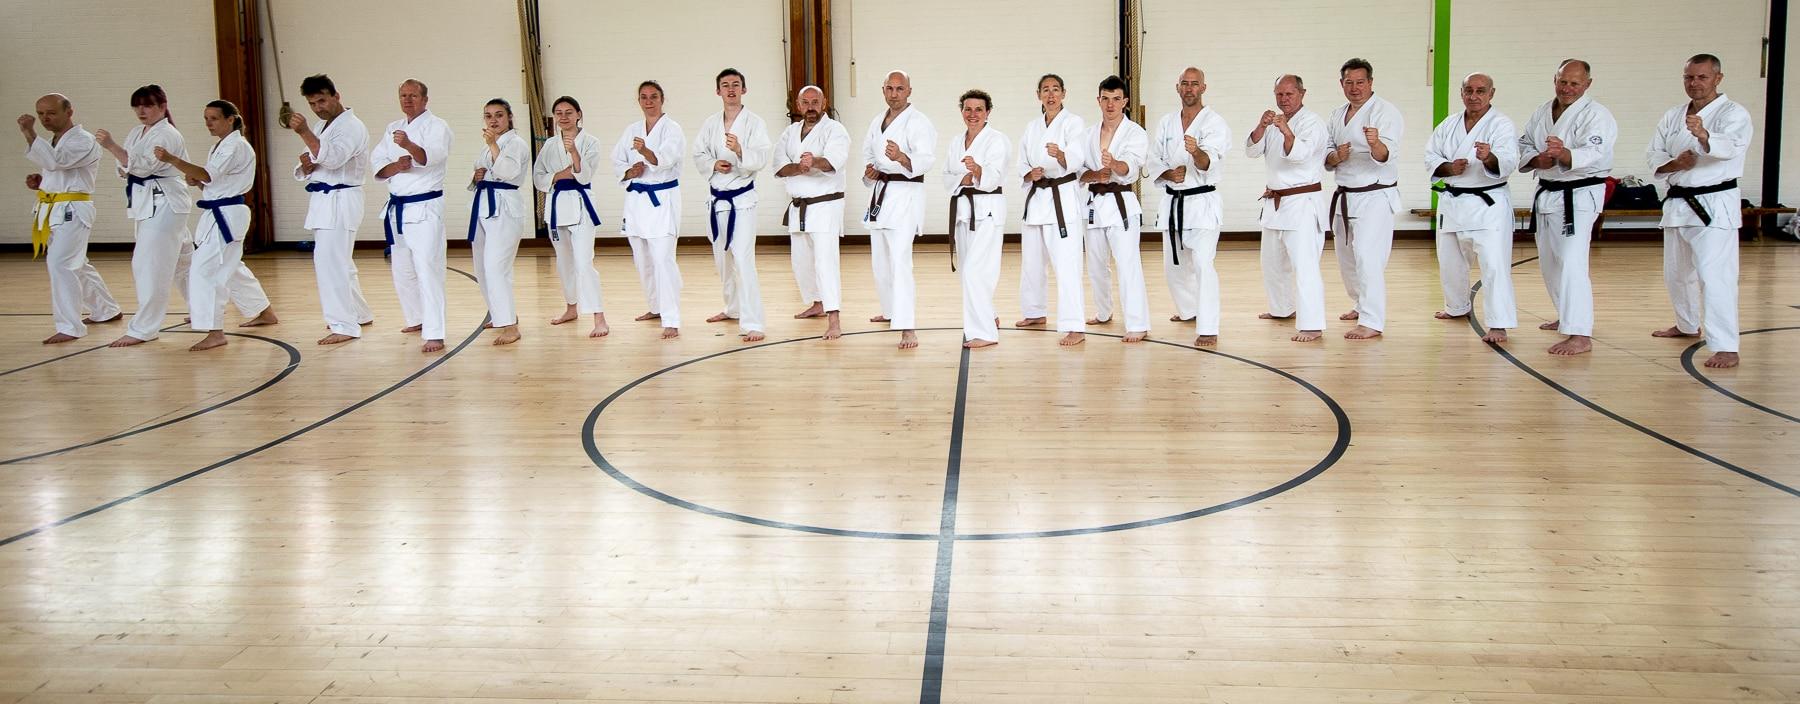 Wado-Ryu Karate Do Ju-Jutsu Kempo martial arts classes in Aldershot, Farnham, Guildford & Haslemere